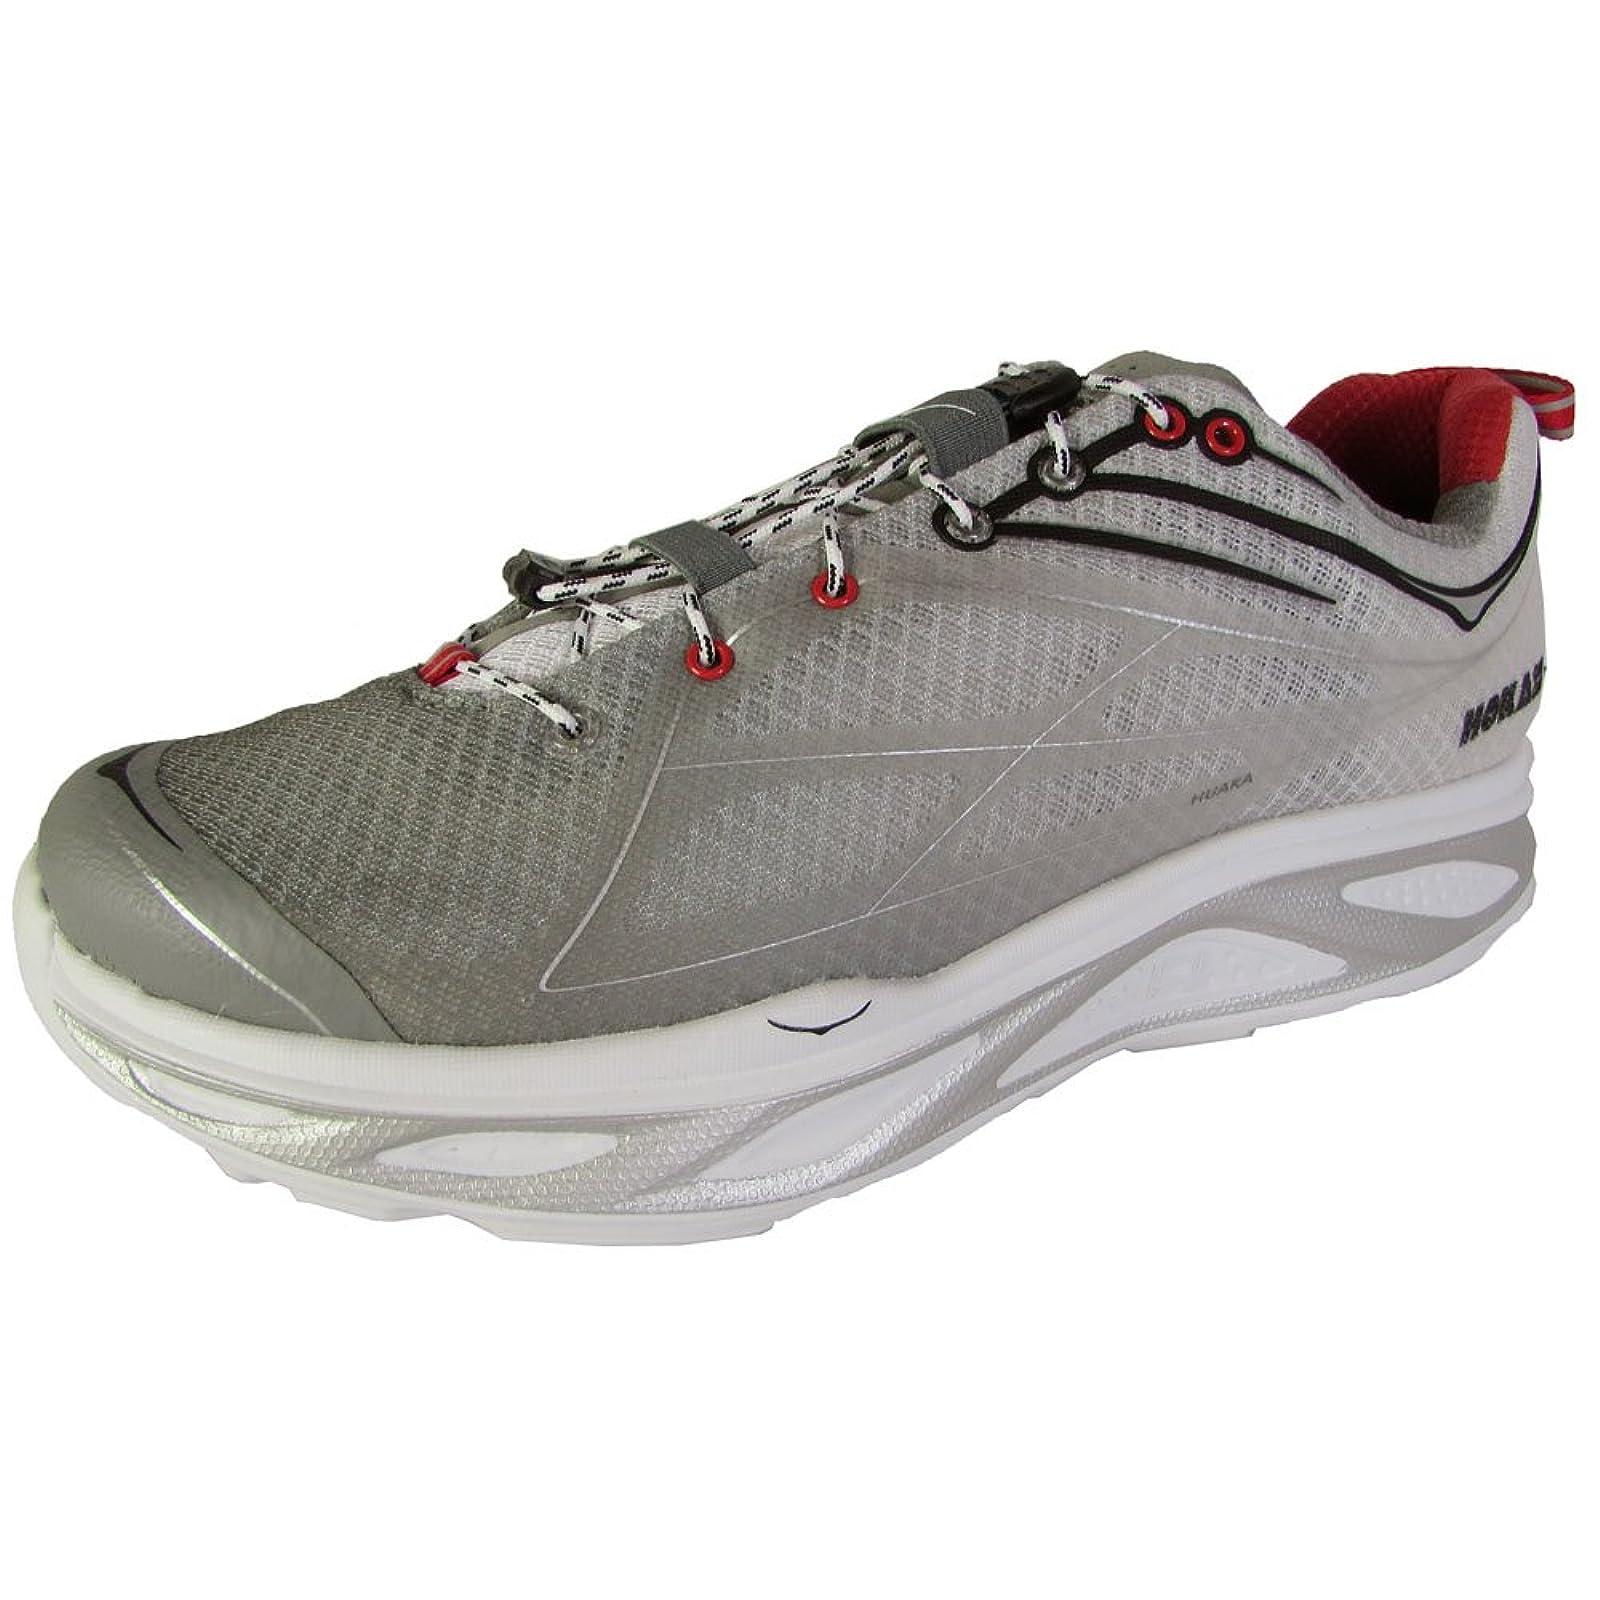 HOKA ONE ONE Mens Huaka Running Sneaker Shoe 8 M US - 6